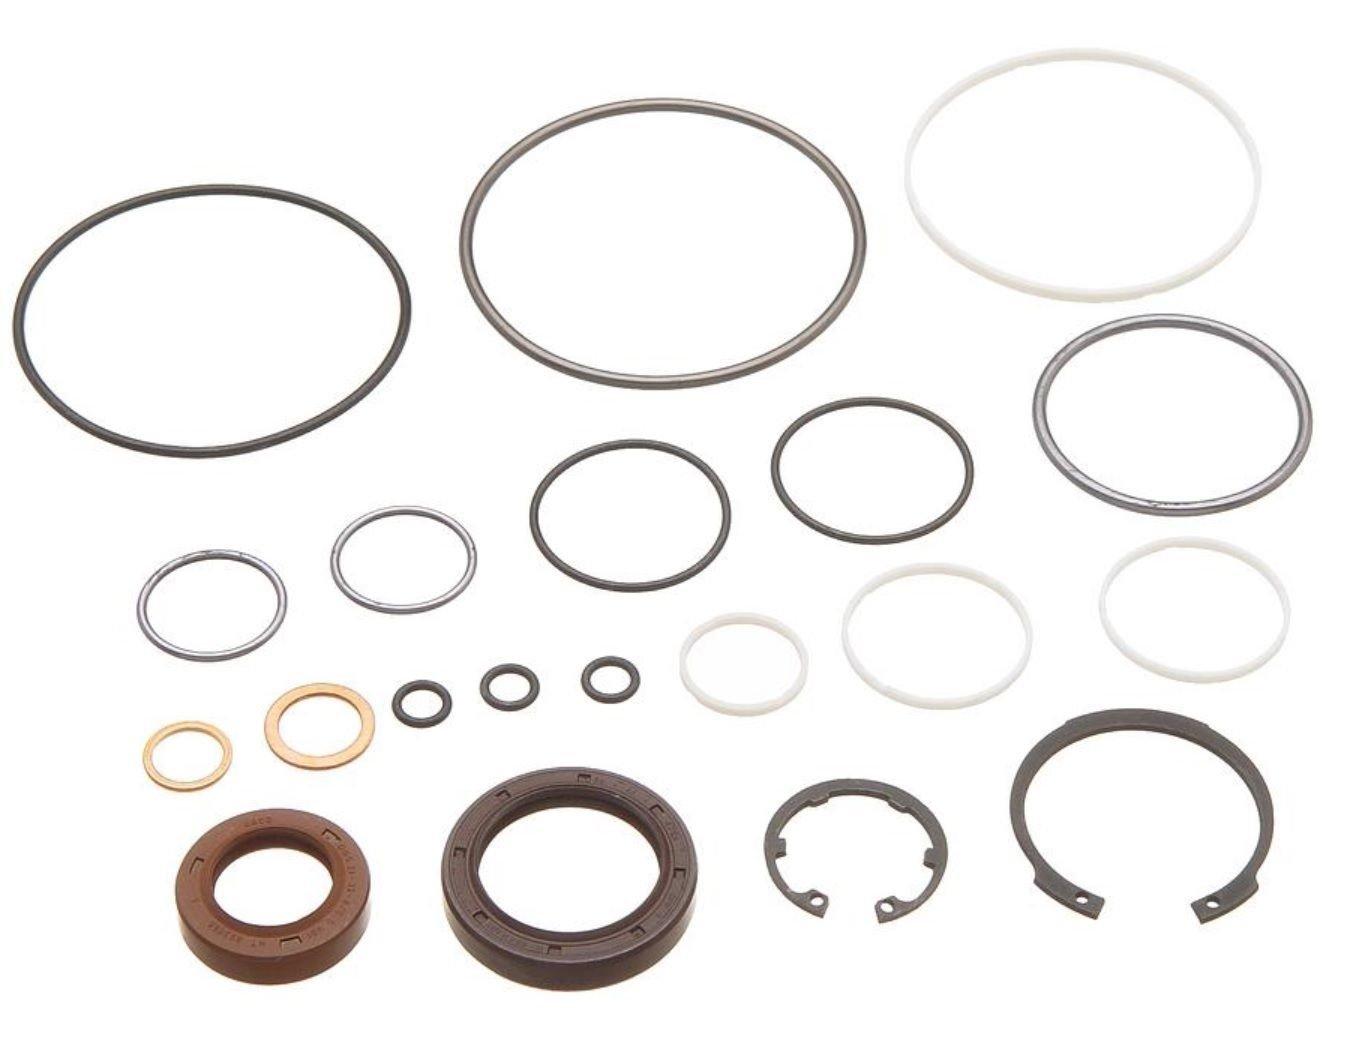 Mercedes 300SL SL320 SL500 SL600 Power Steering Gear Box Seal Kit HUBMULLER